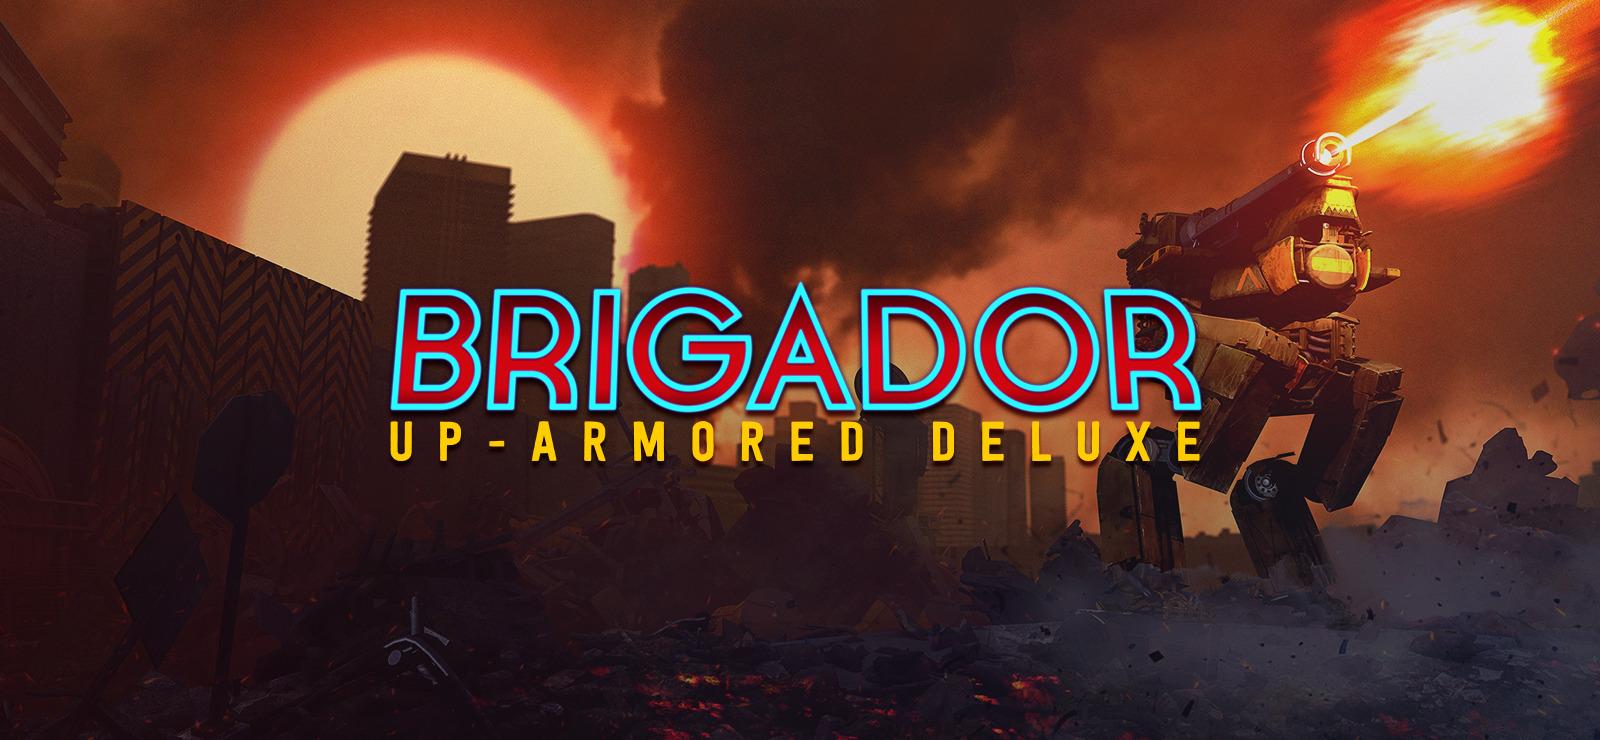 Brigador Up-Armored Deluxe-GOG